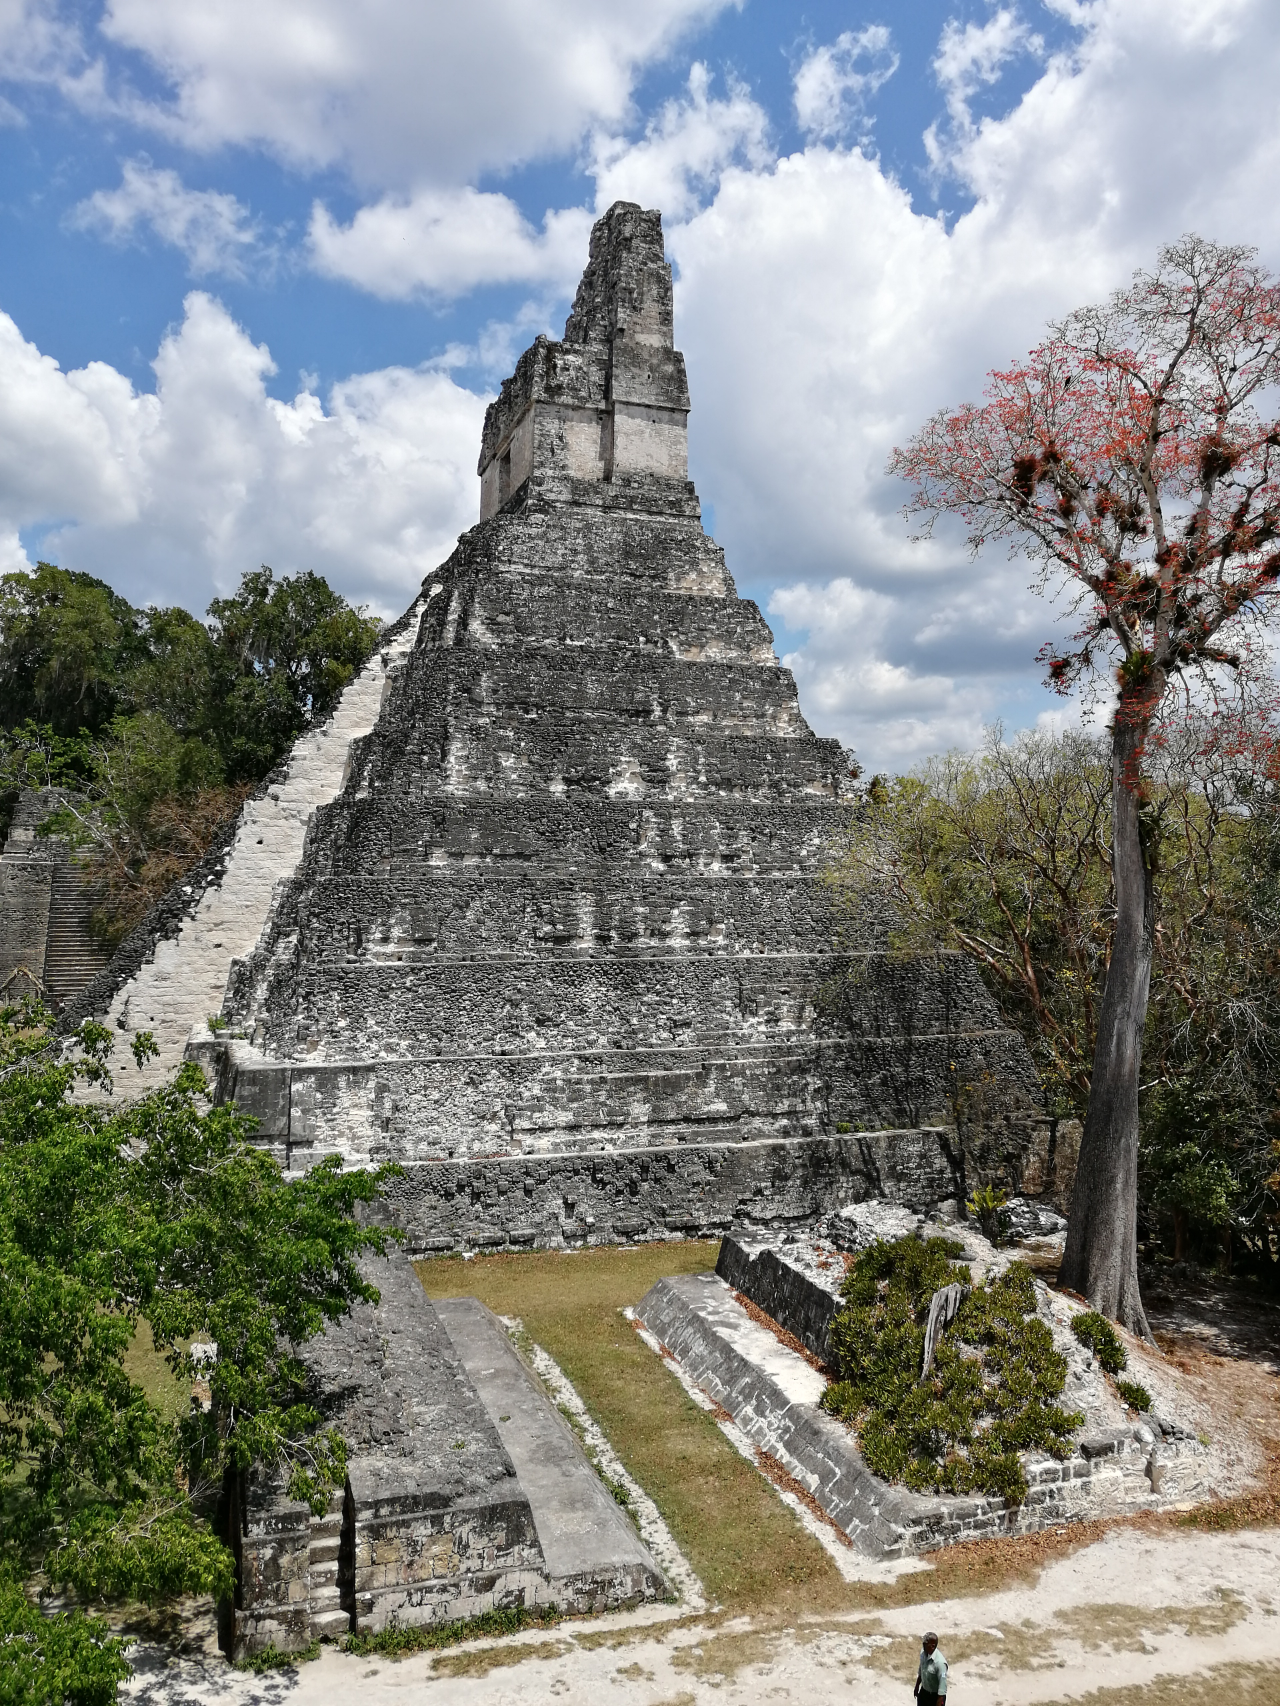 Photo 2: Tikal, la merveille - Guatemala